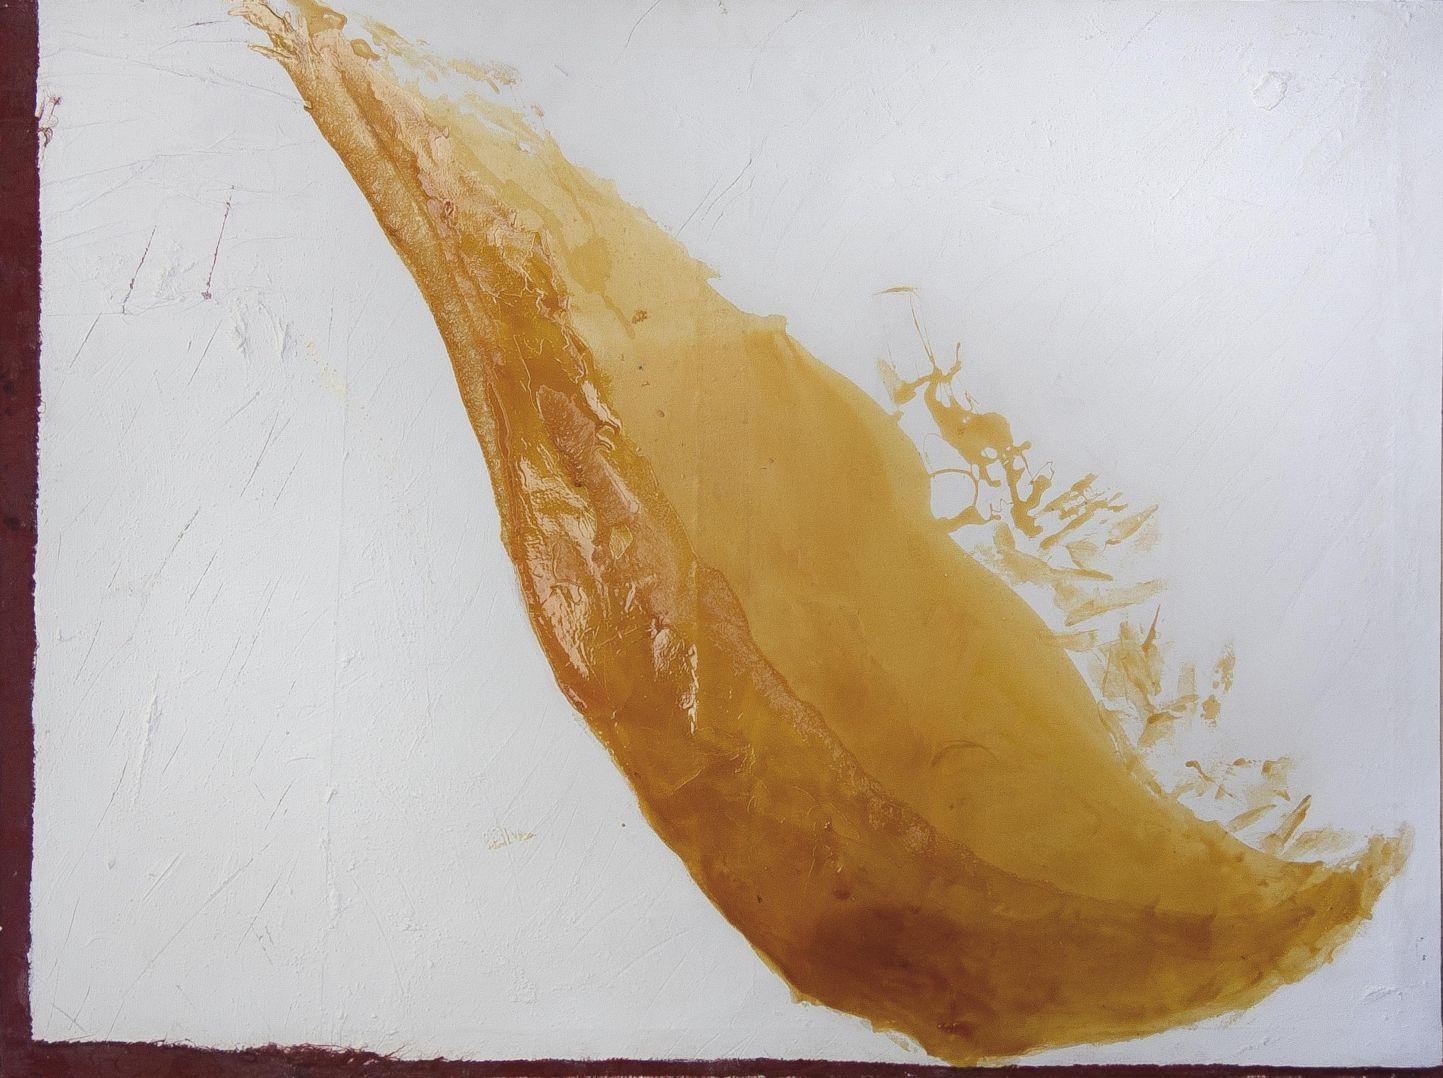 recolecció de la mel (2017) - Vicent Aparicio-Guadas